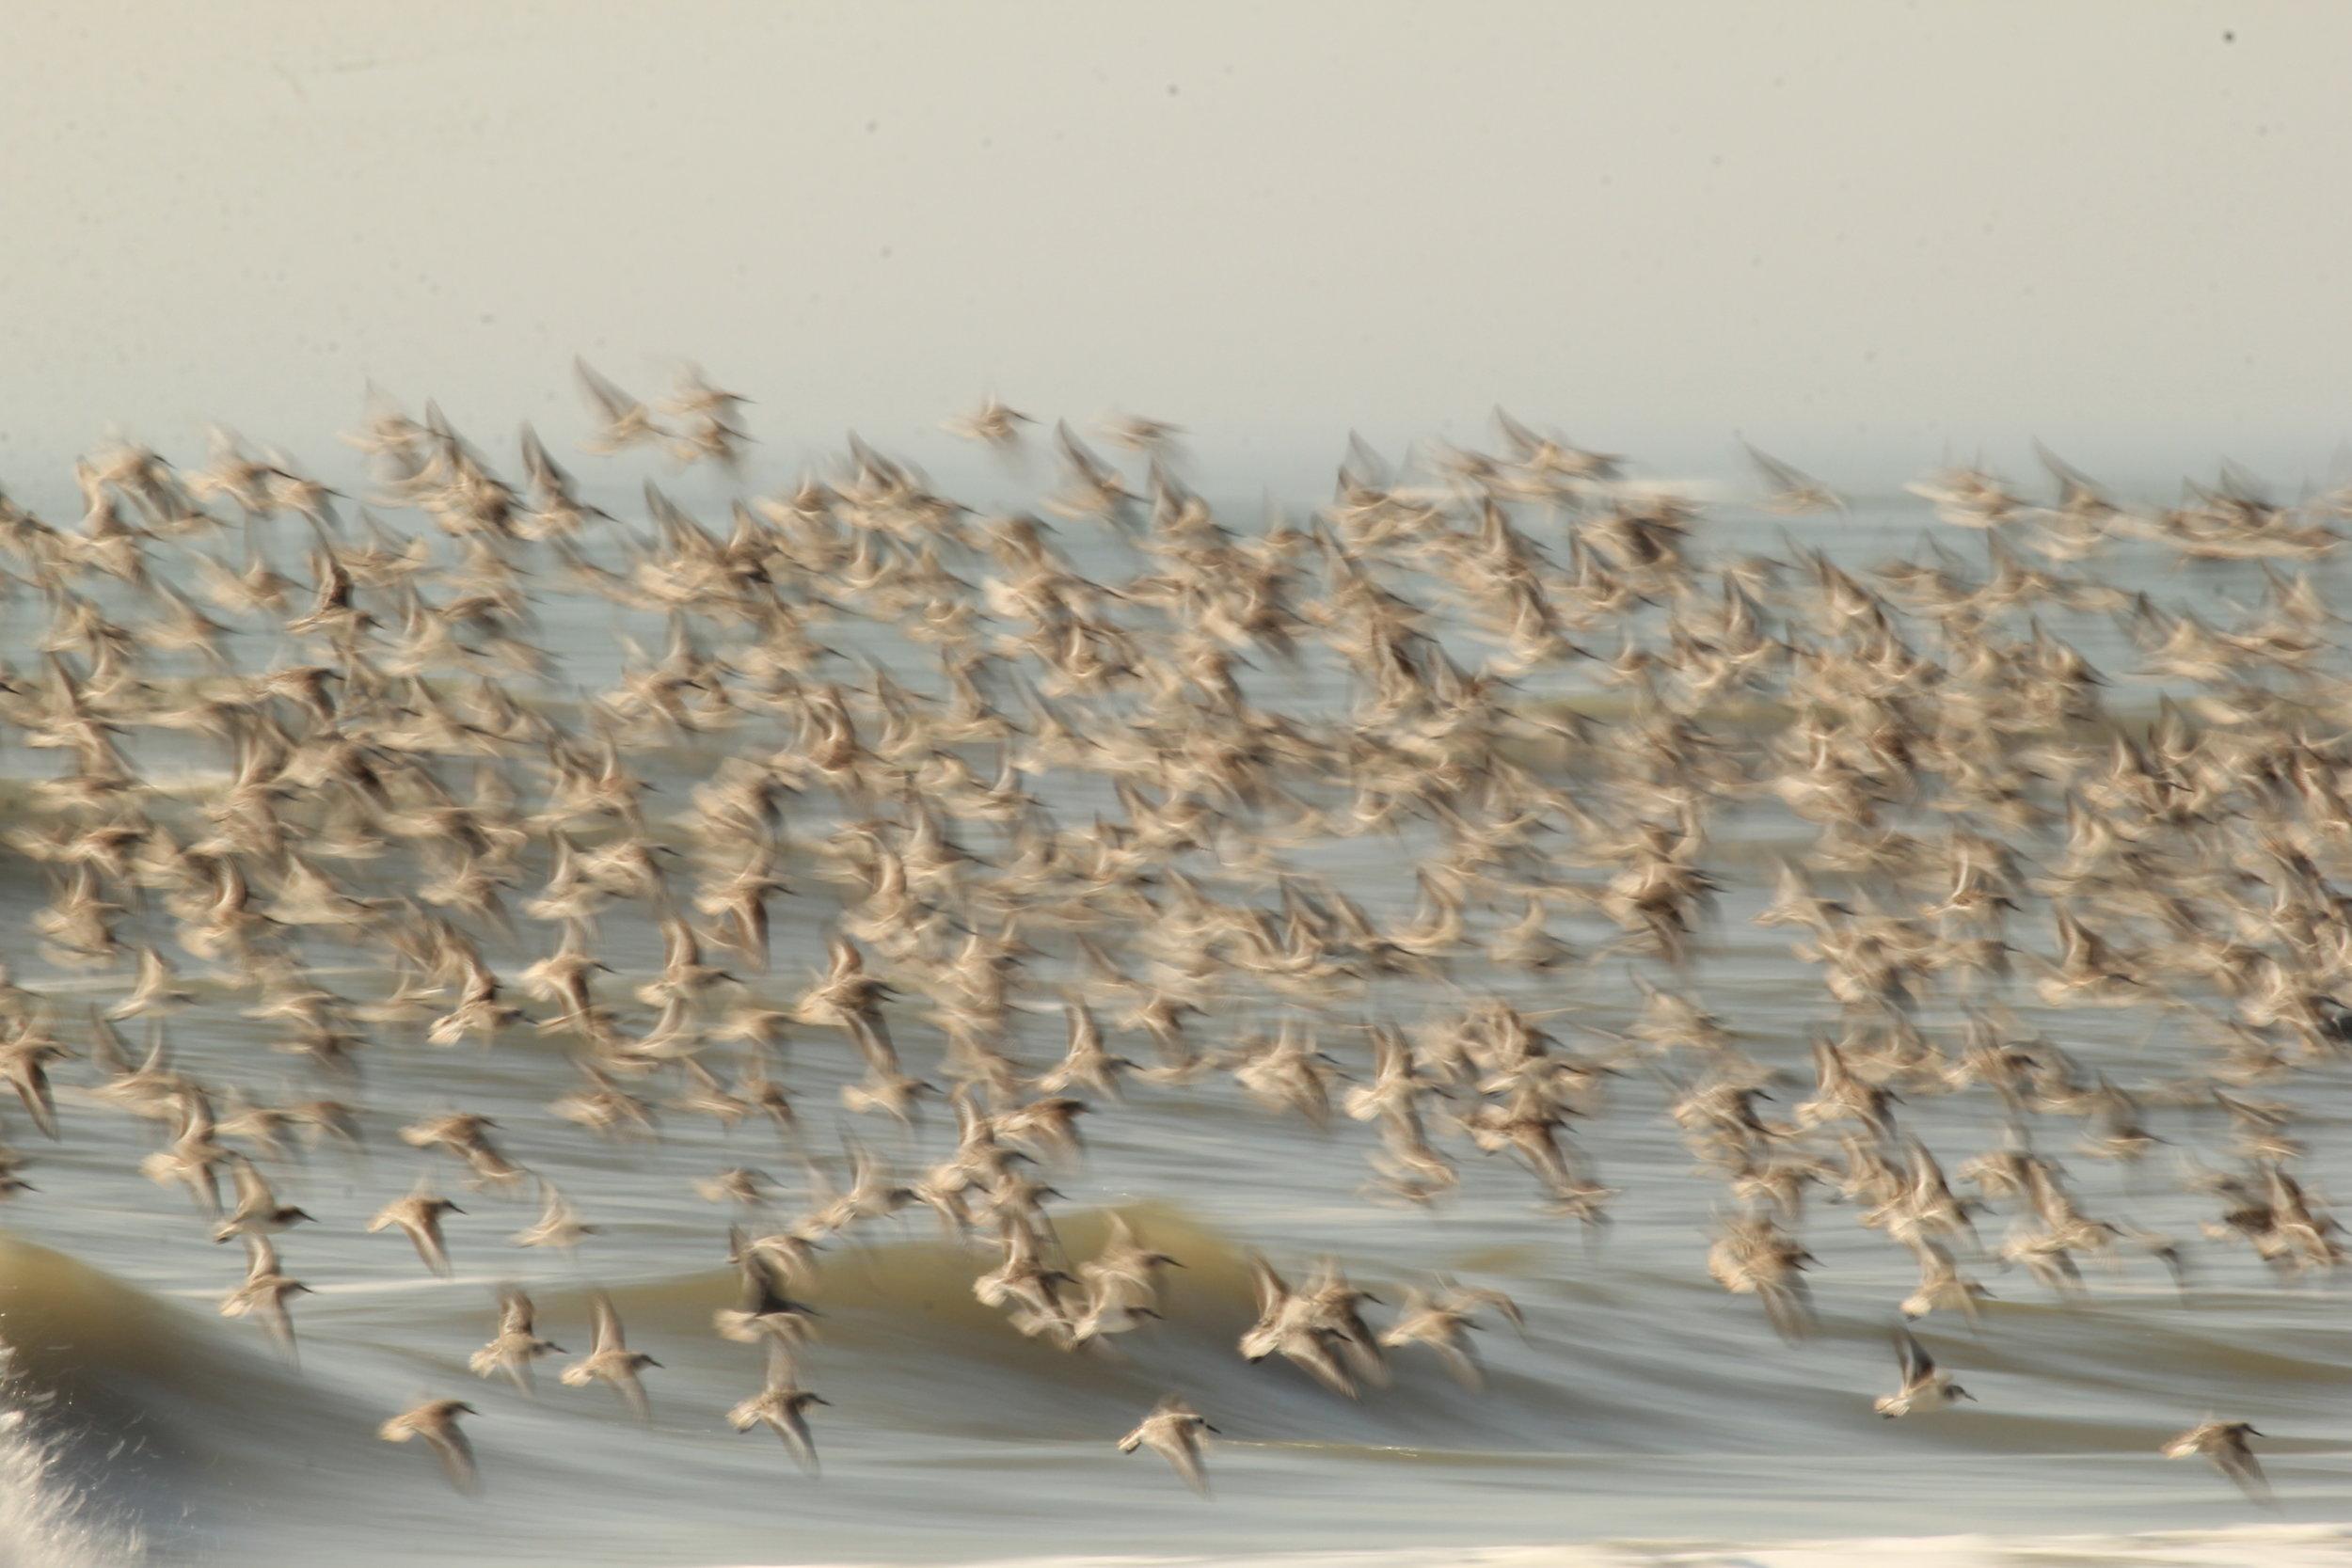 - B. Identify, track and create a local baseline for seabird, migratory coastal bird or coastal bird populations.